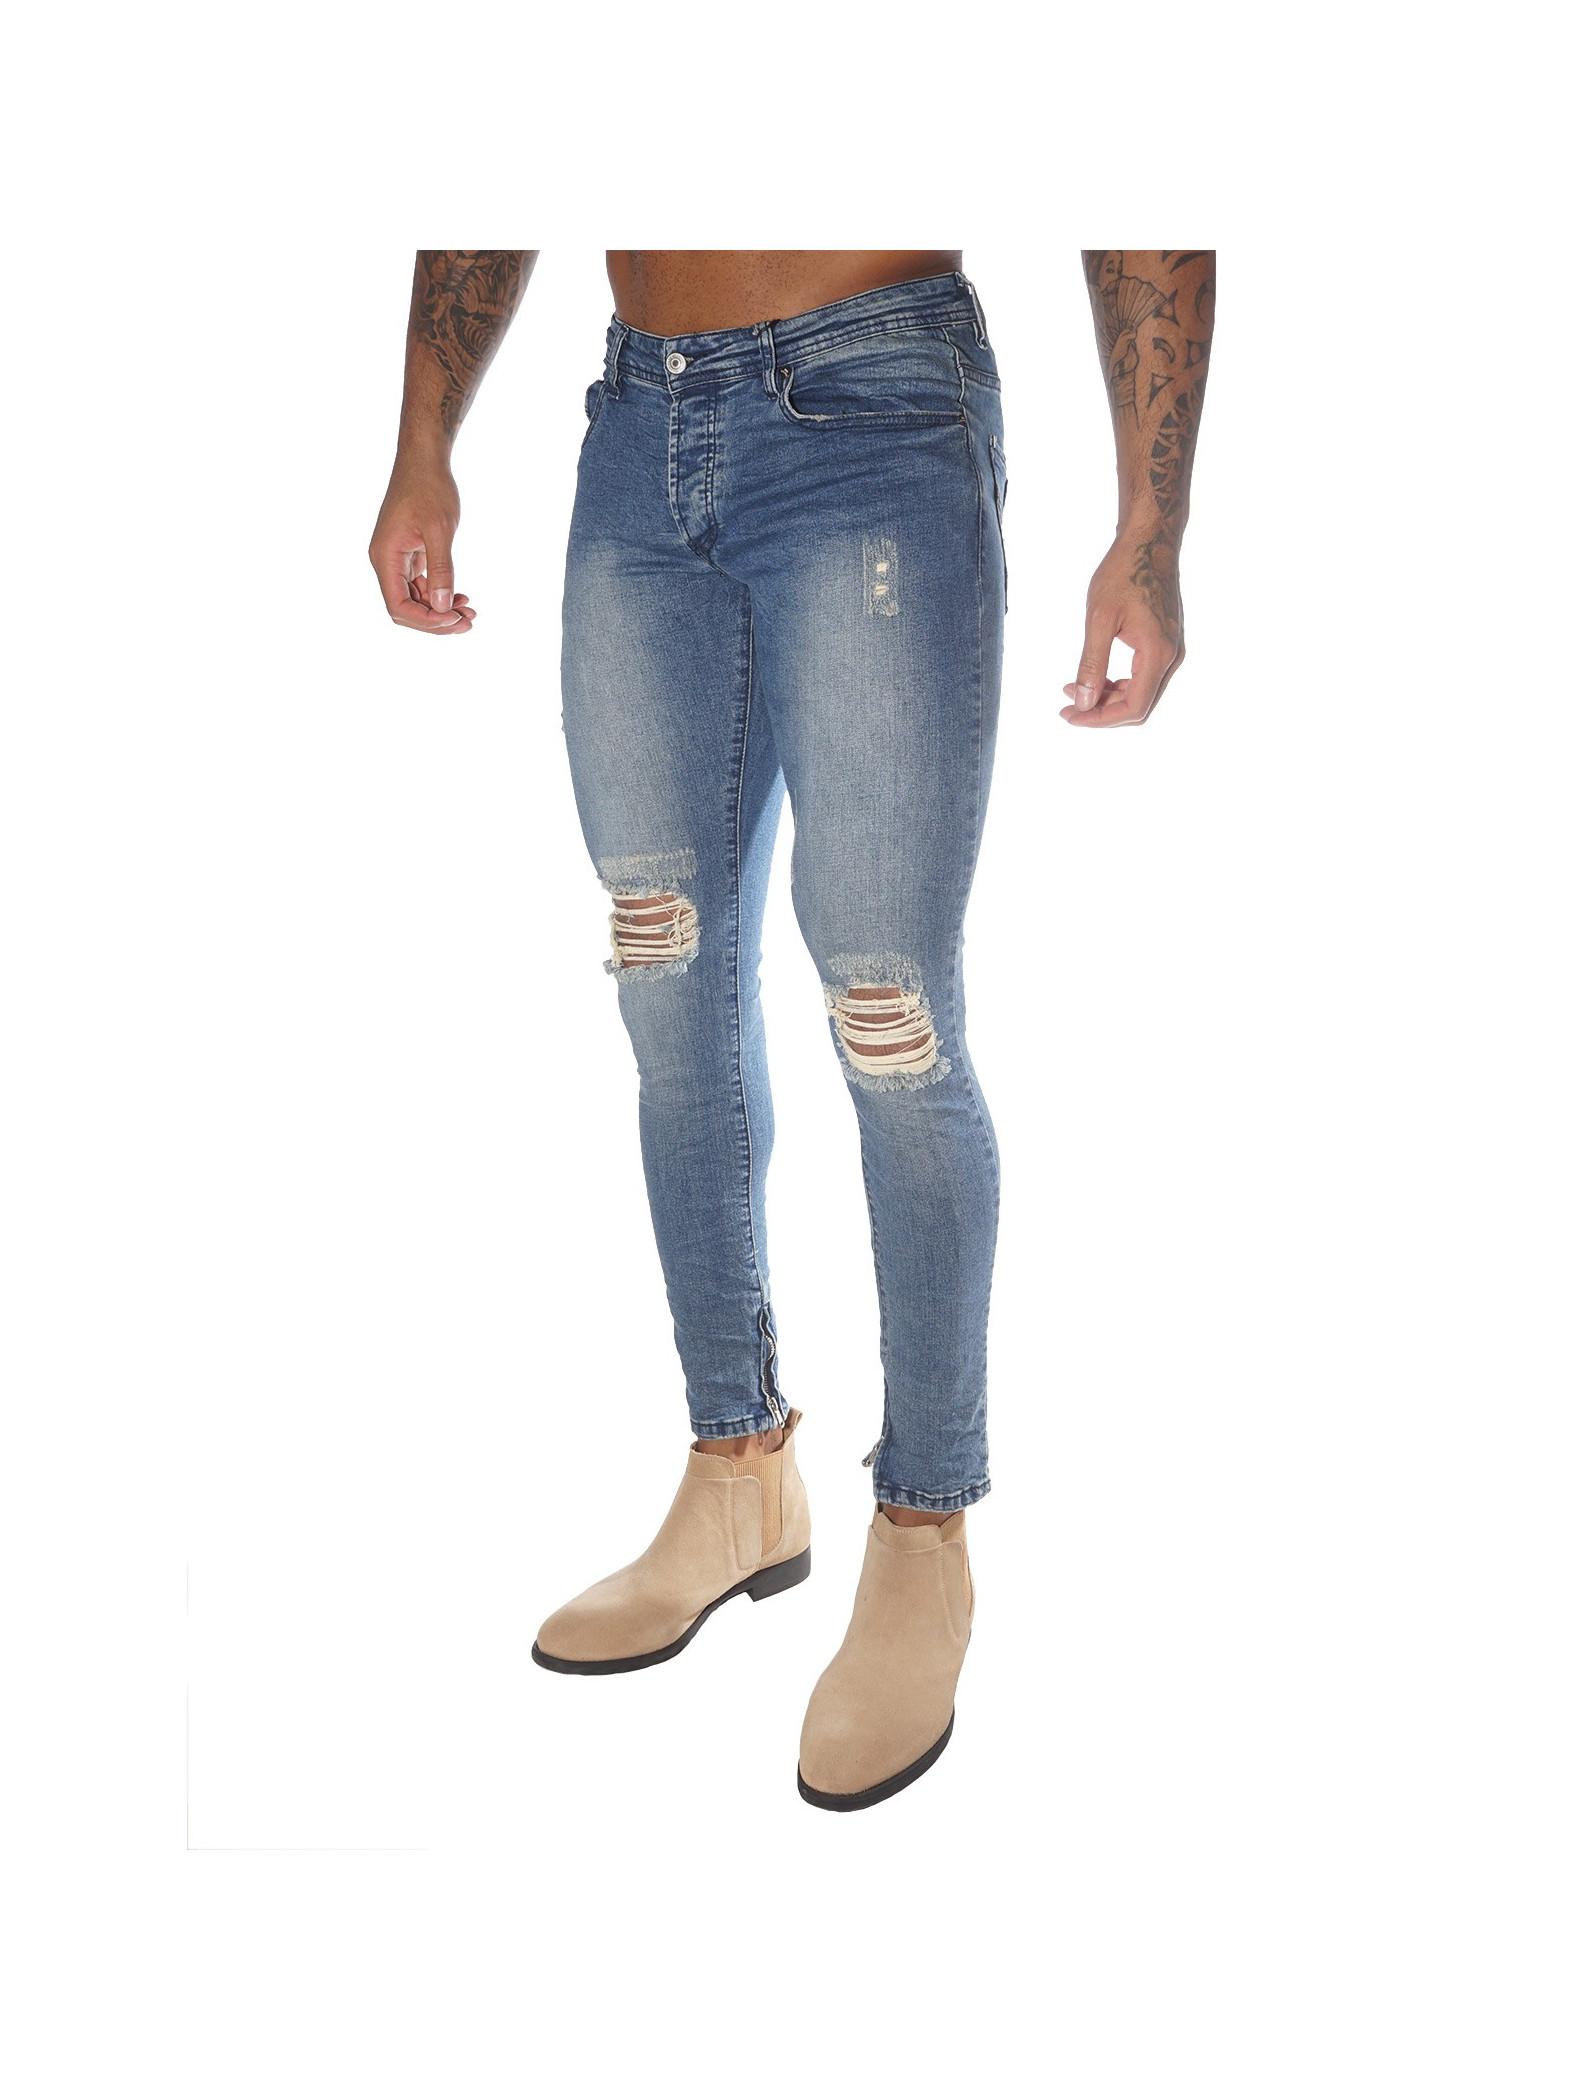 slim fit distressed jeans project x paris 88169963. Black Bedroom Furniture Sets. Home Design Ideas